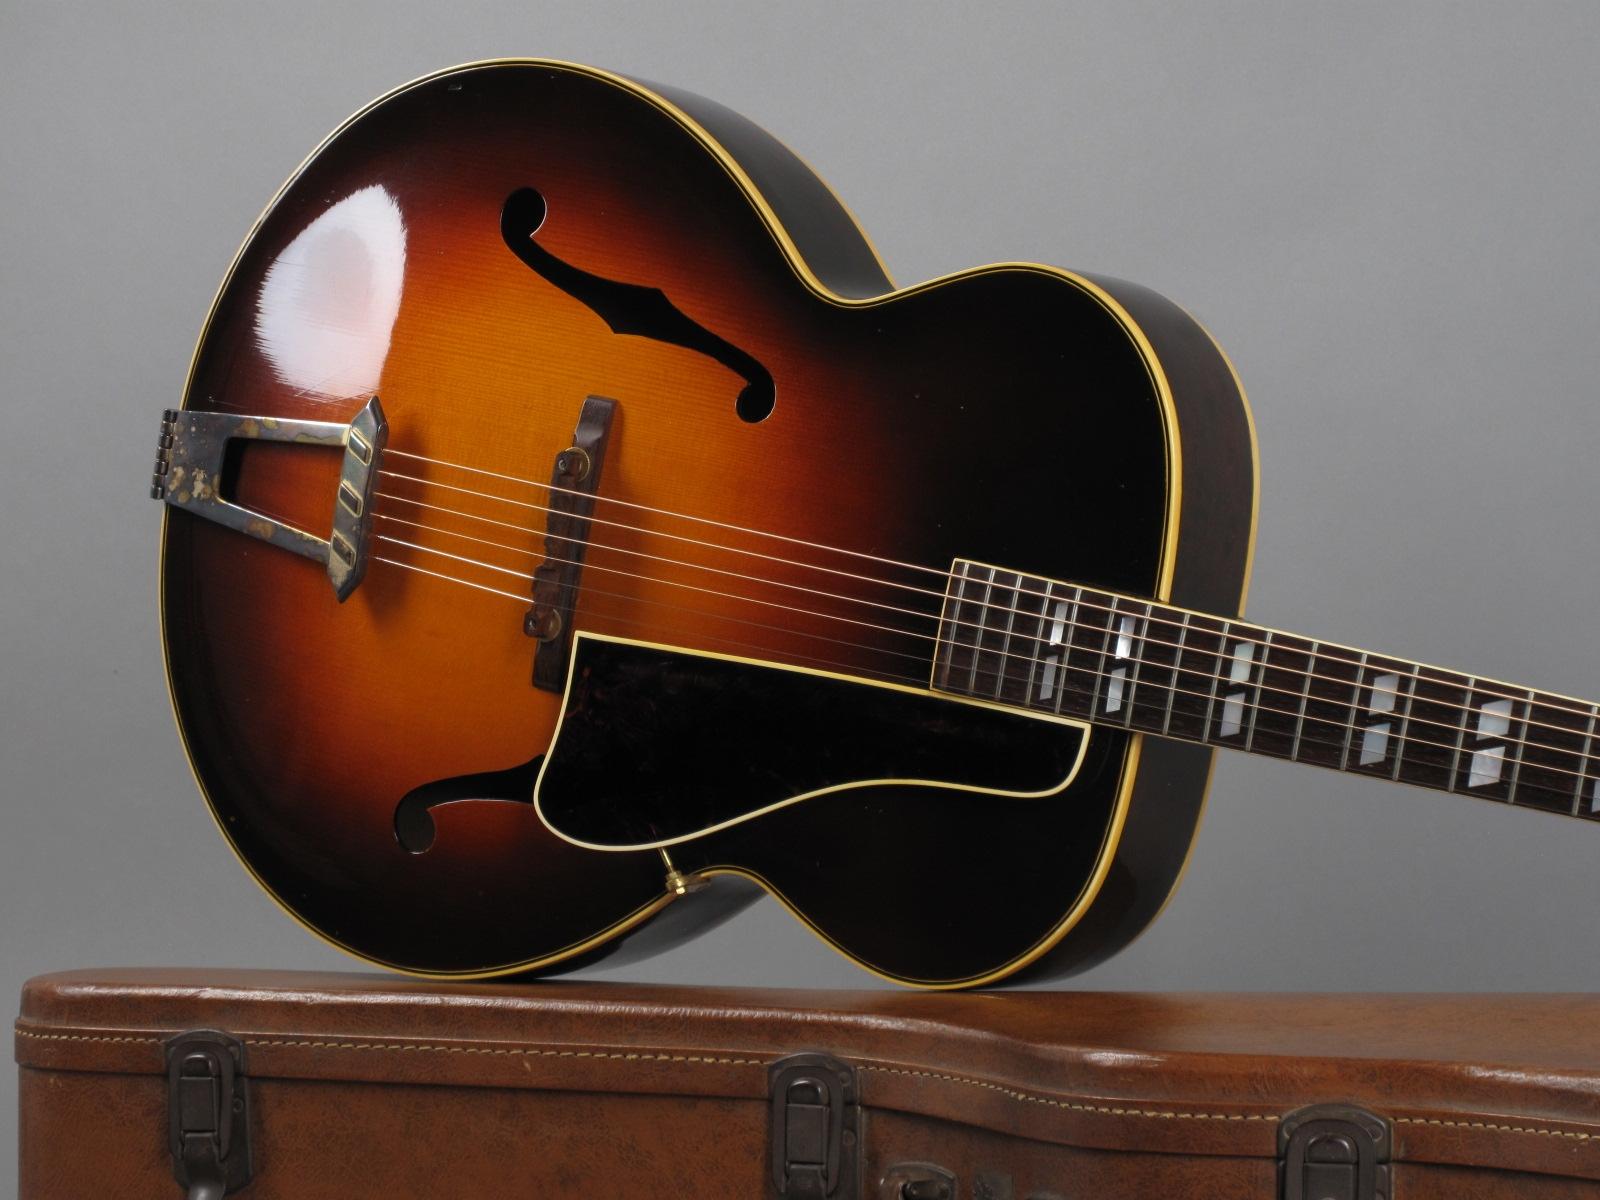 https://guitarpoint.de/app/uploads/products/1941-gibson-l-12-sunburst/1943-Gibson-L12-Sunburst-97245_19.jpg